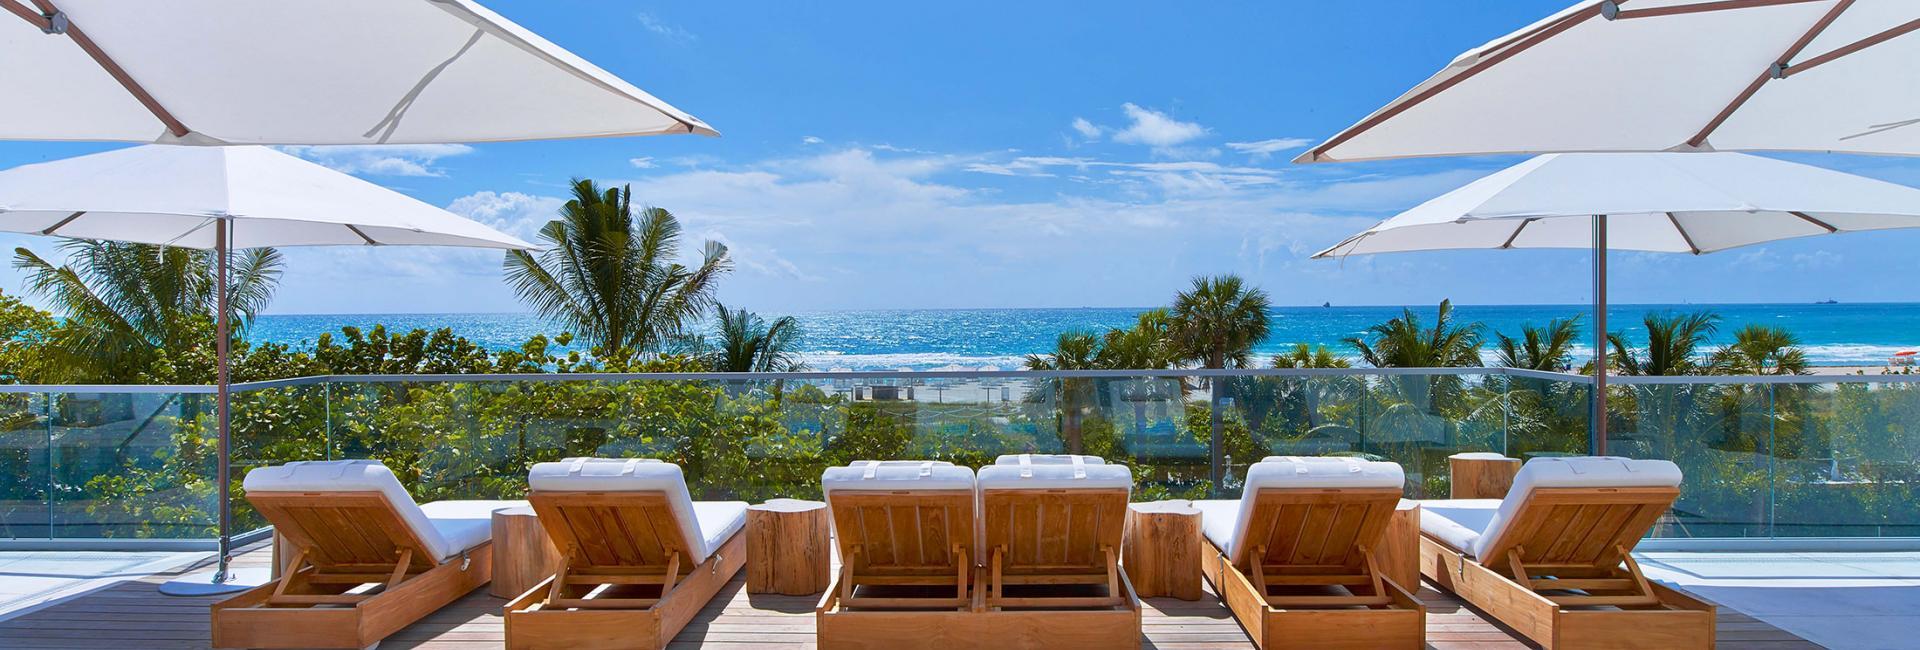 cabana day beds next to a pool